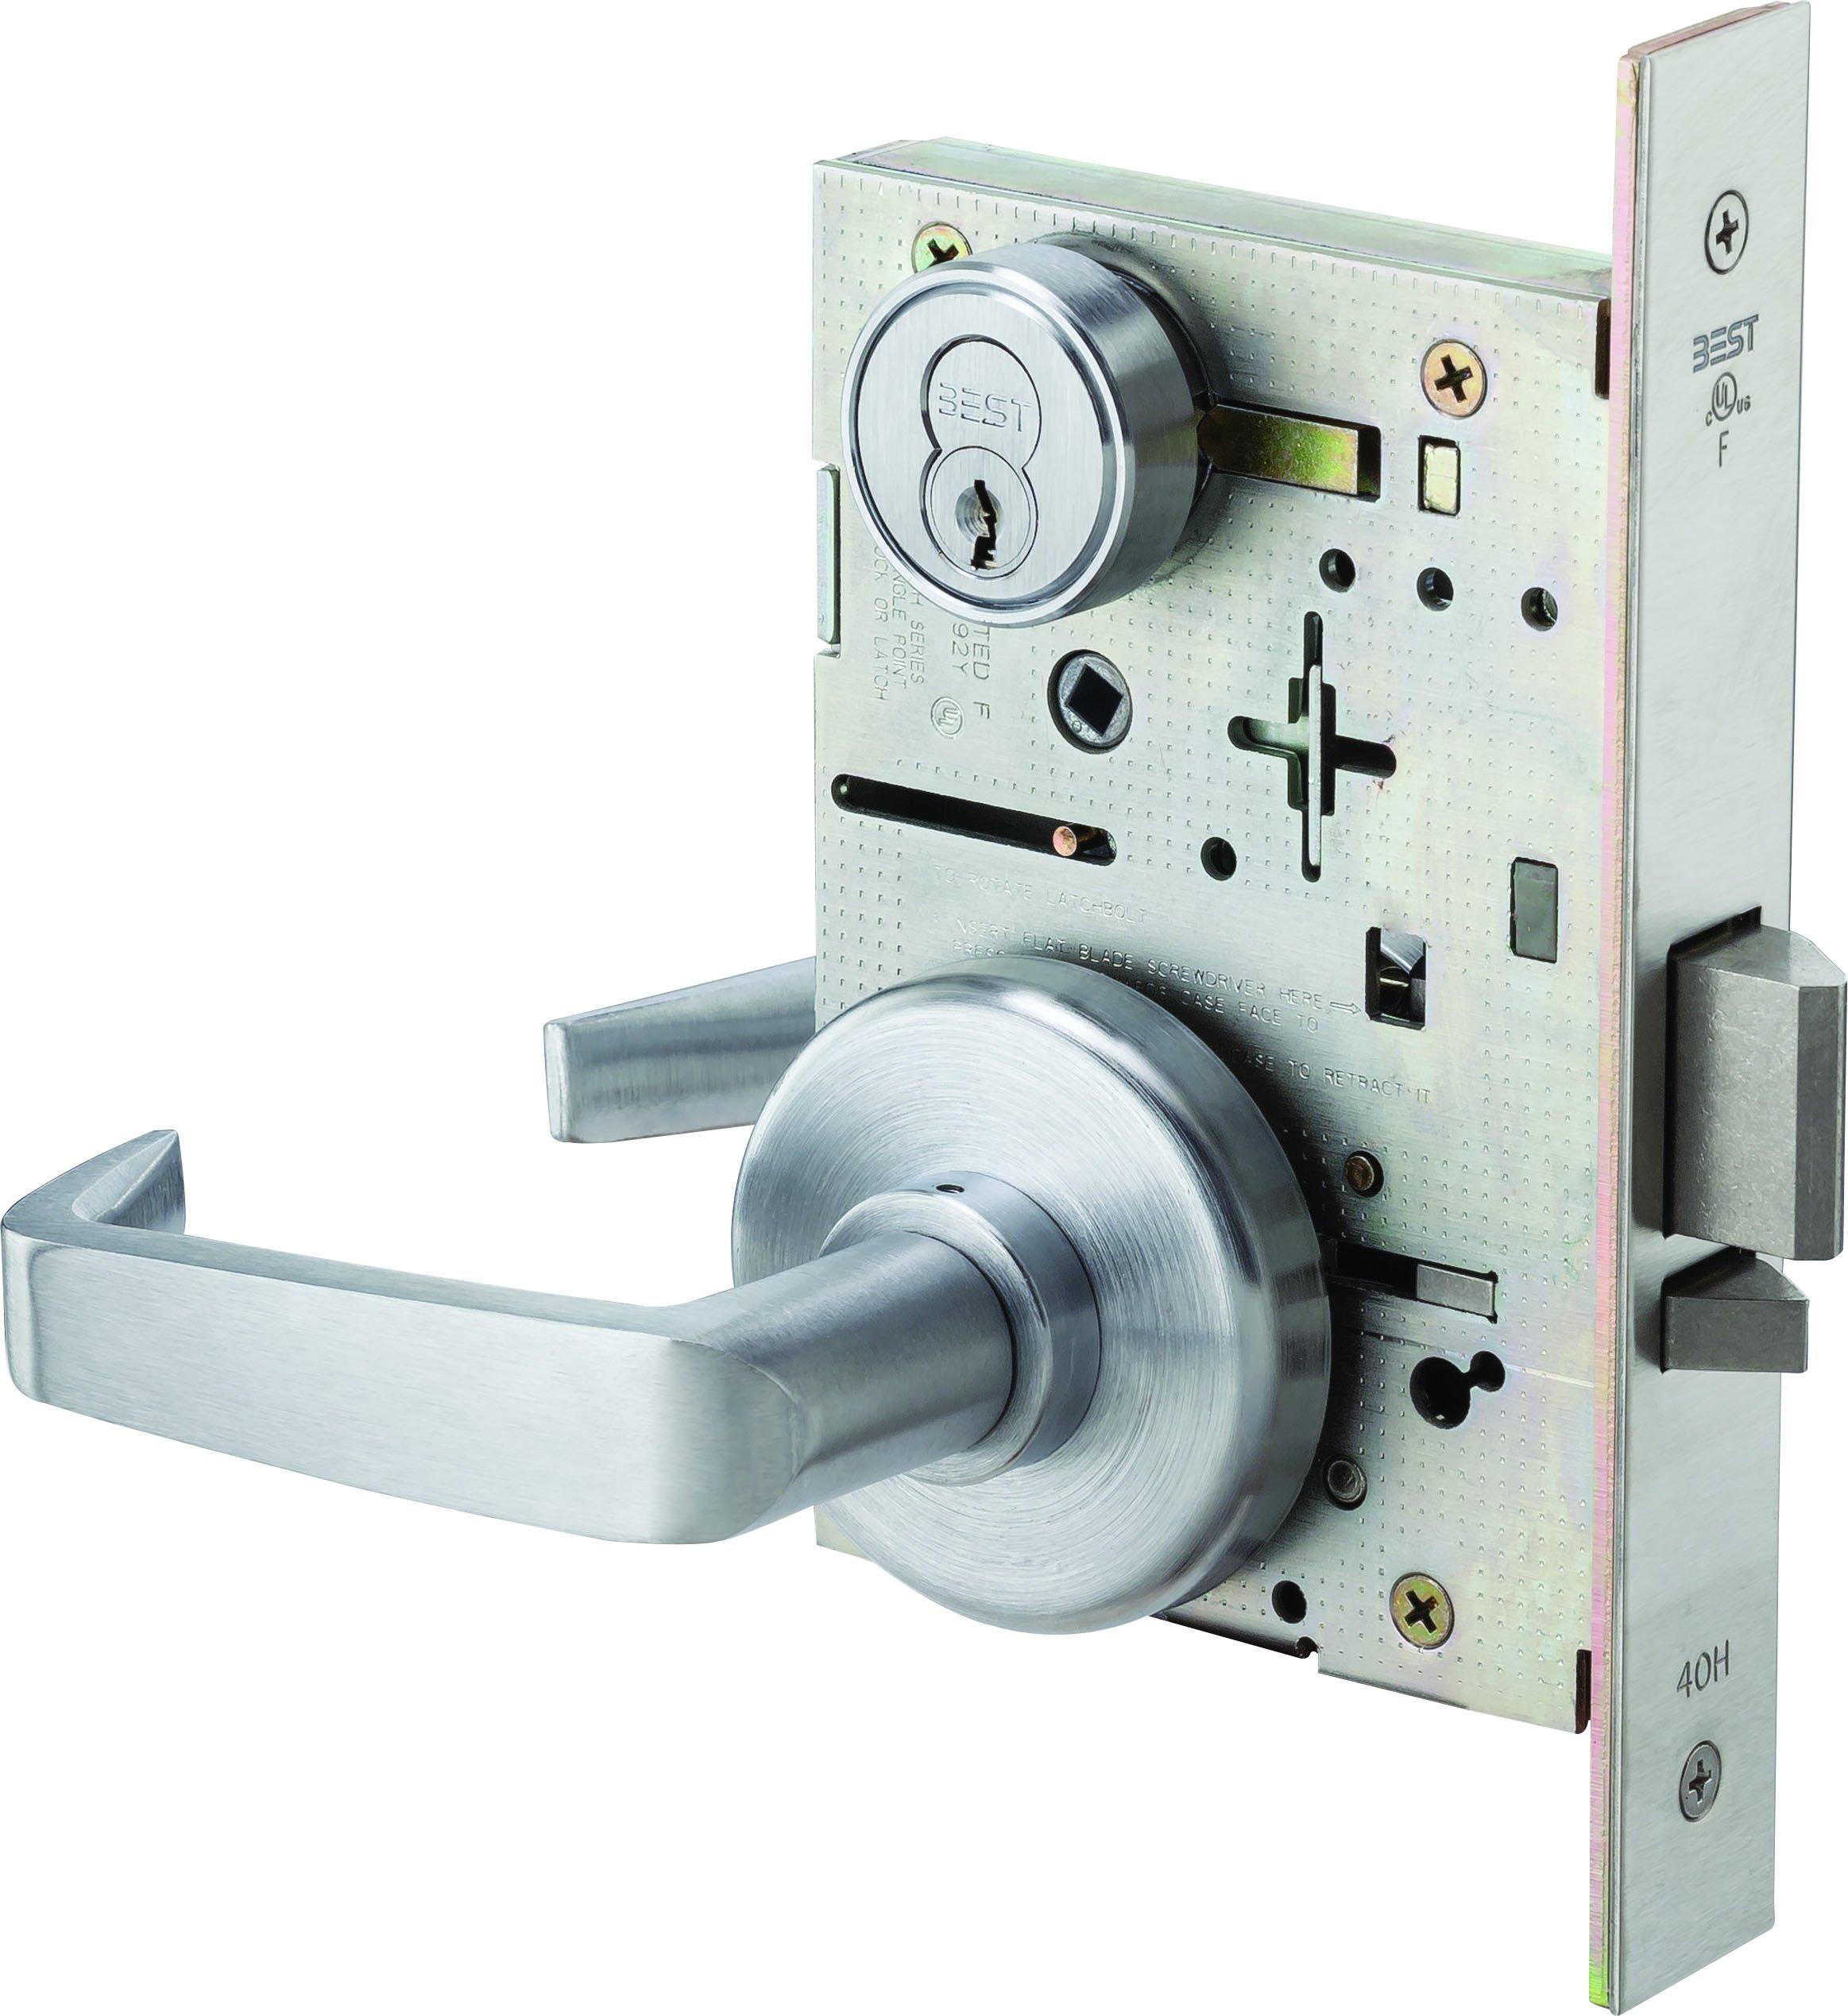 Stanley Best 45H 7 D 15 H 626 RH 7-Pin Contour Angle Return Standard Lever Lock, Storeroom, Satin Chrome, 2''